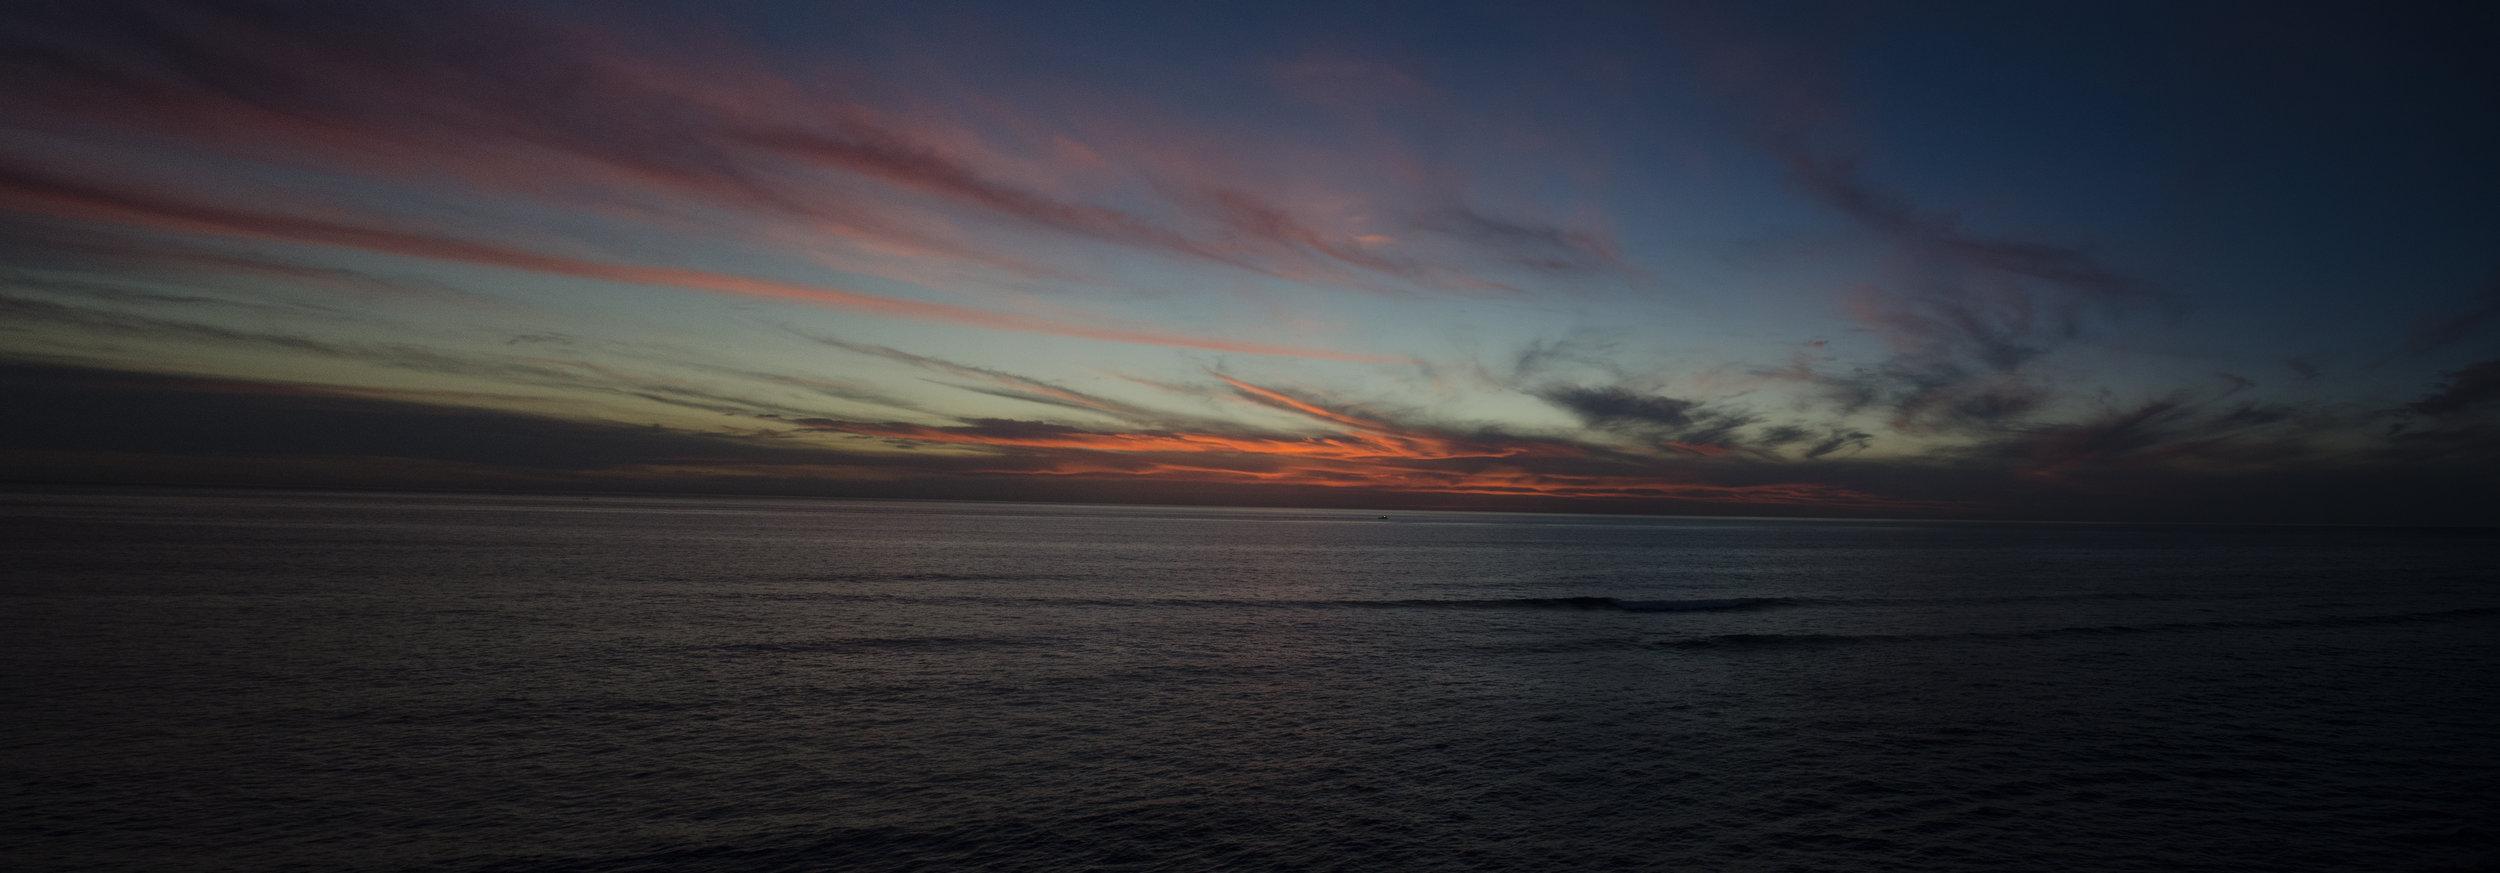 panoramic-west-coast-sunset_16856105442_o.jpg